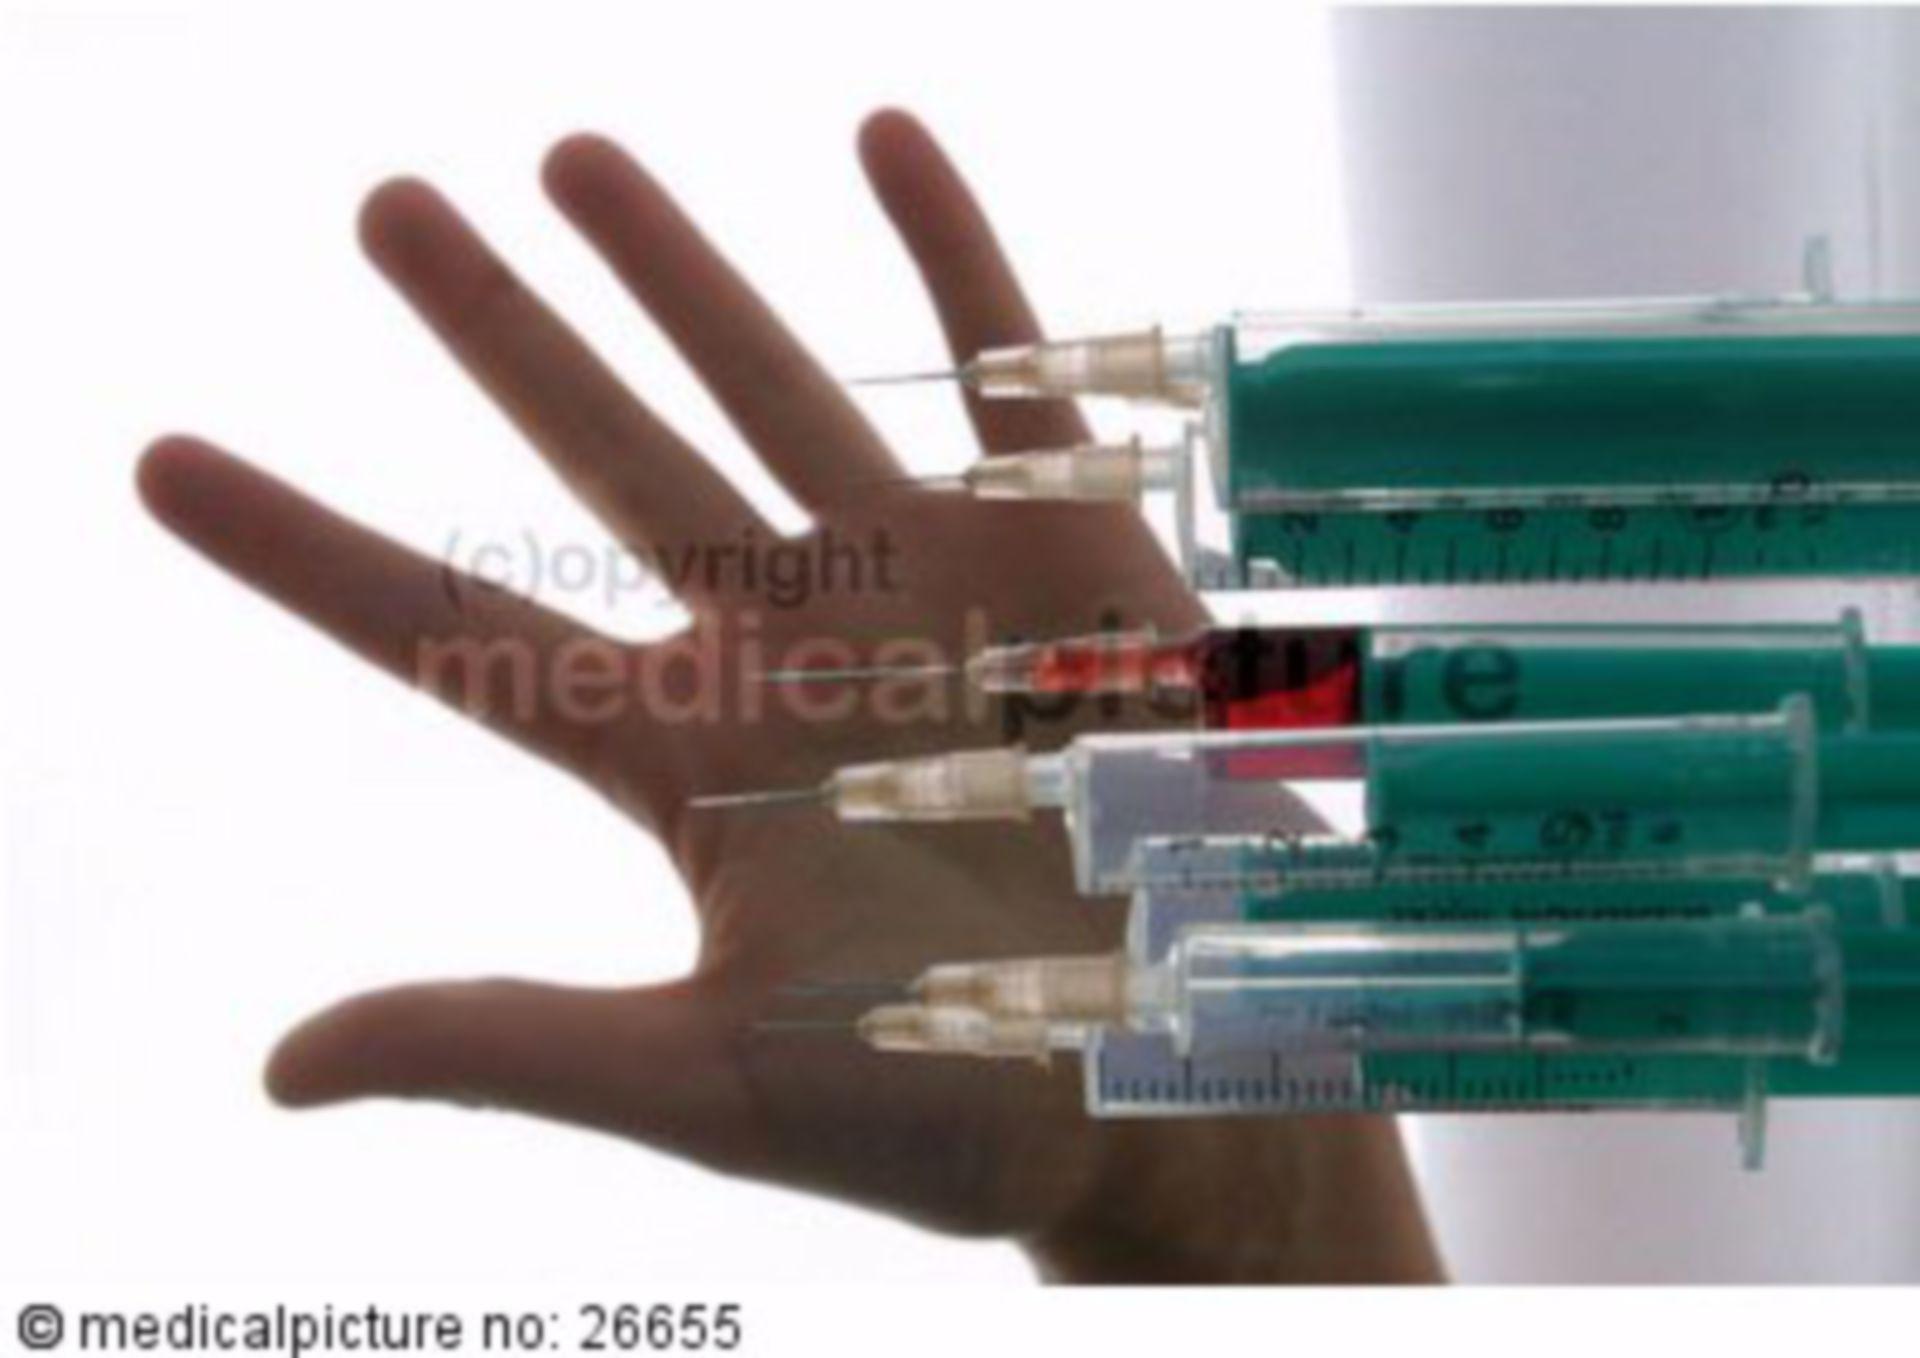 Symbol of injection injury